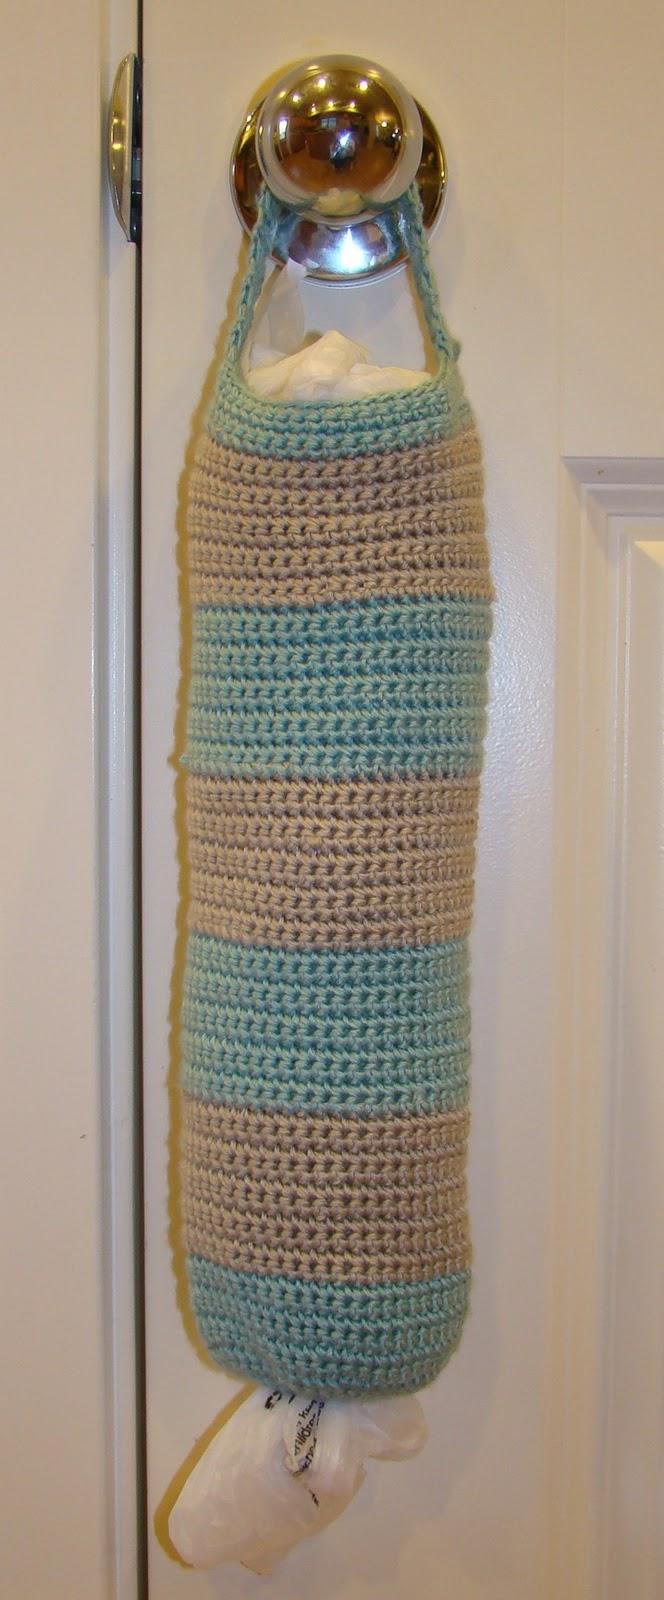 Crochet Pattern For Trash Bag Holder : Crafts By Starlight: Striped Grocery Bag Holder - Crochet